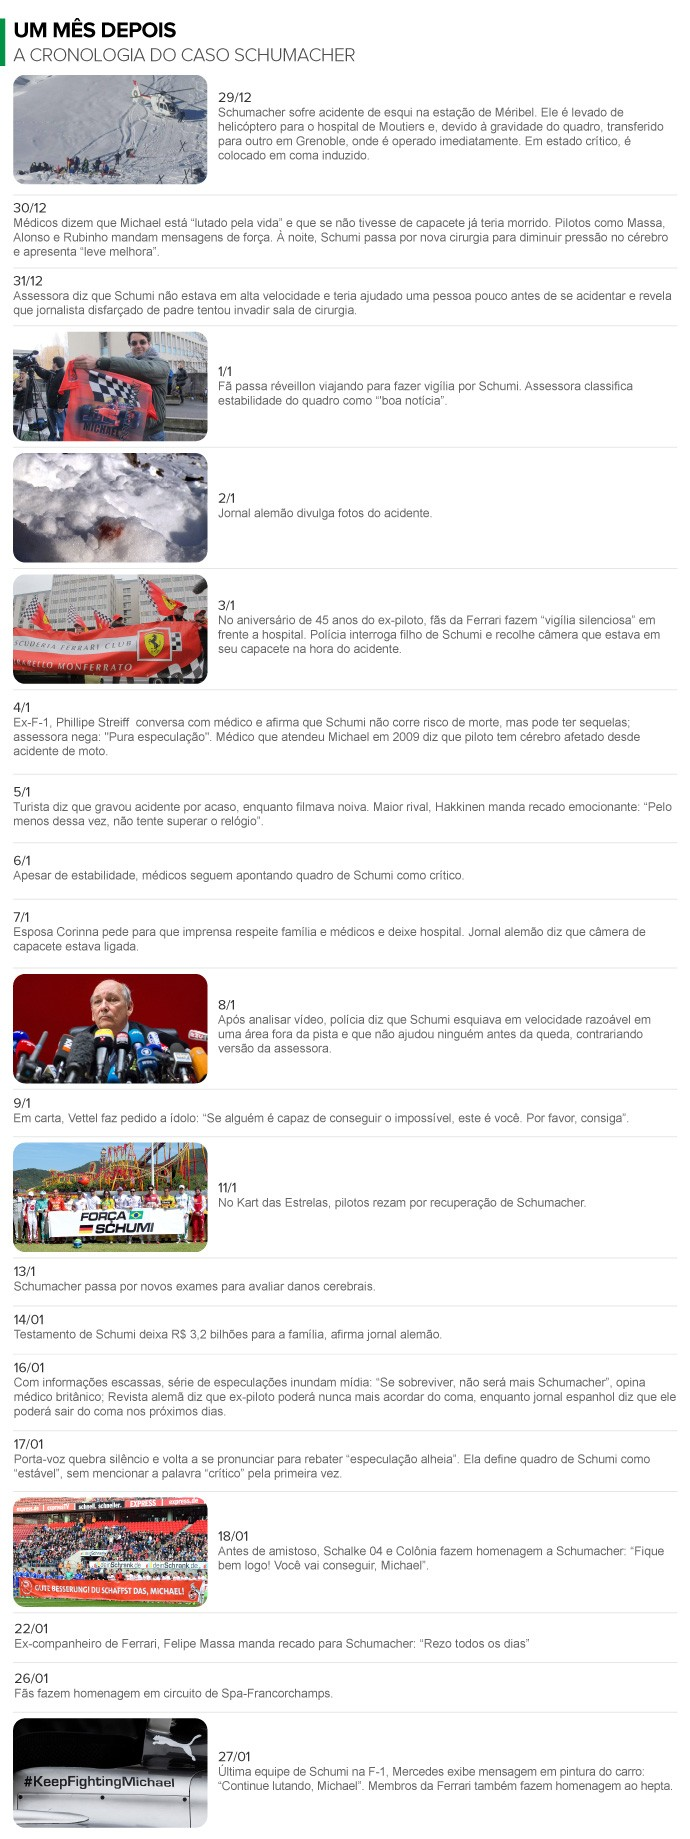 info cronologia acidente Schumacher - 2 (Foto: infoesporte)